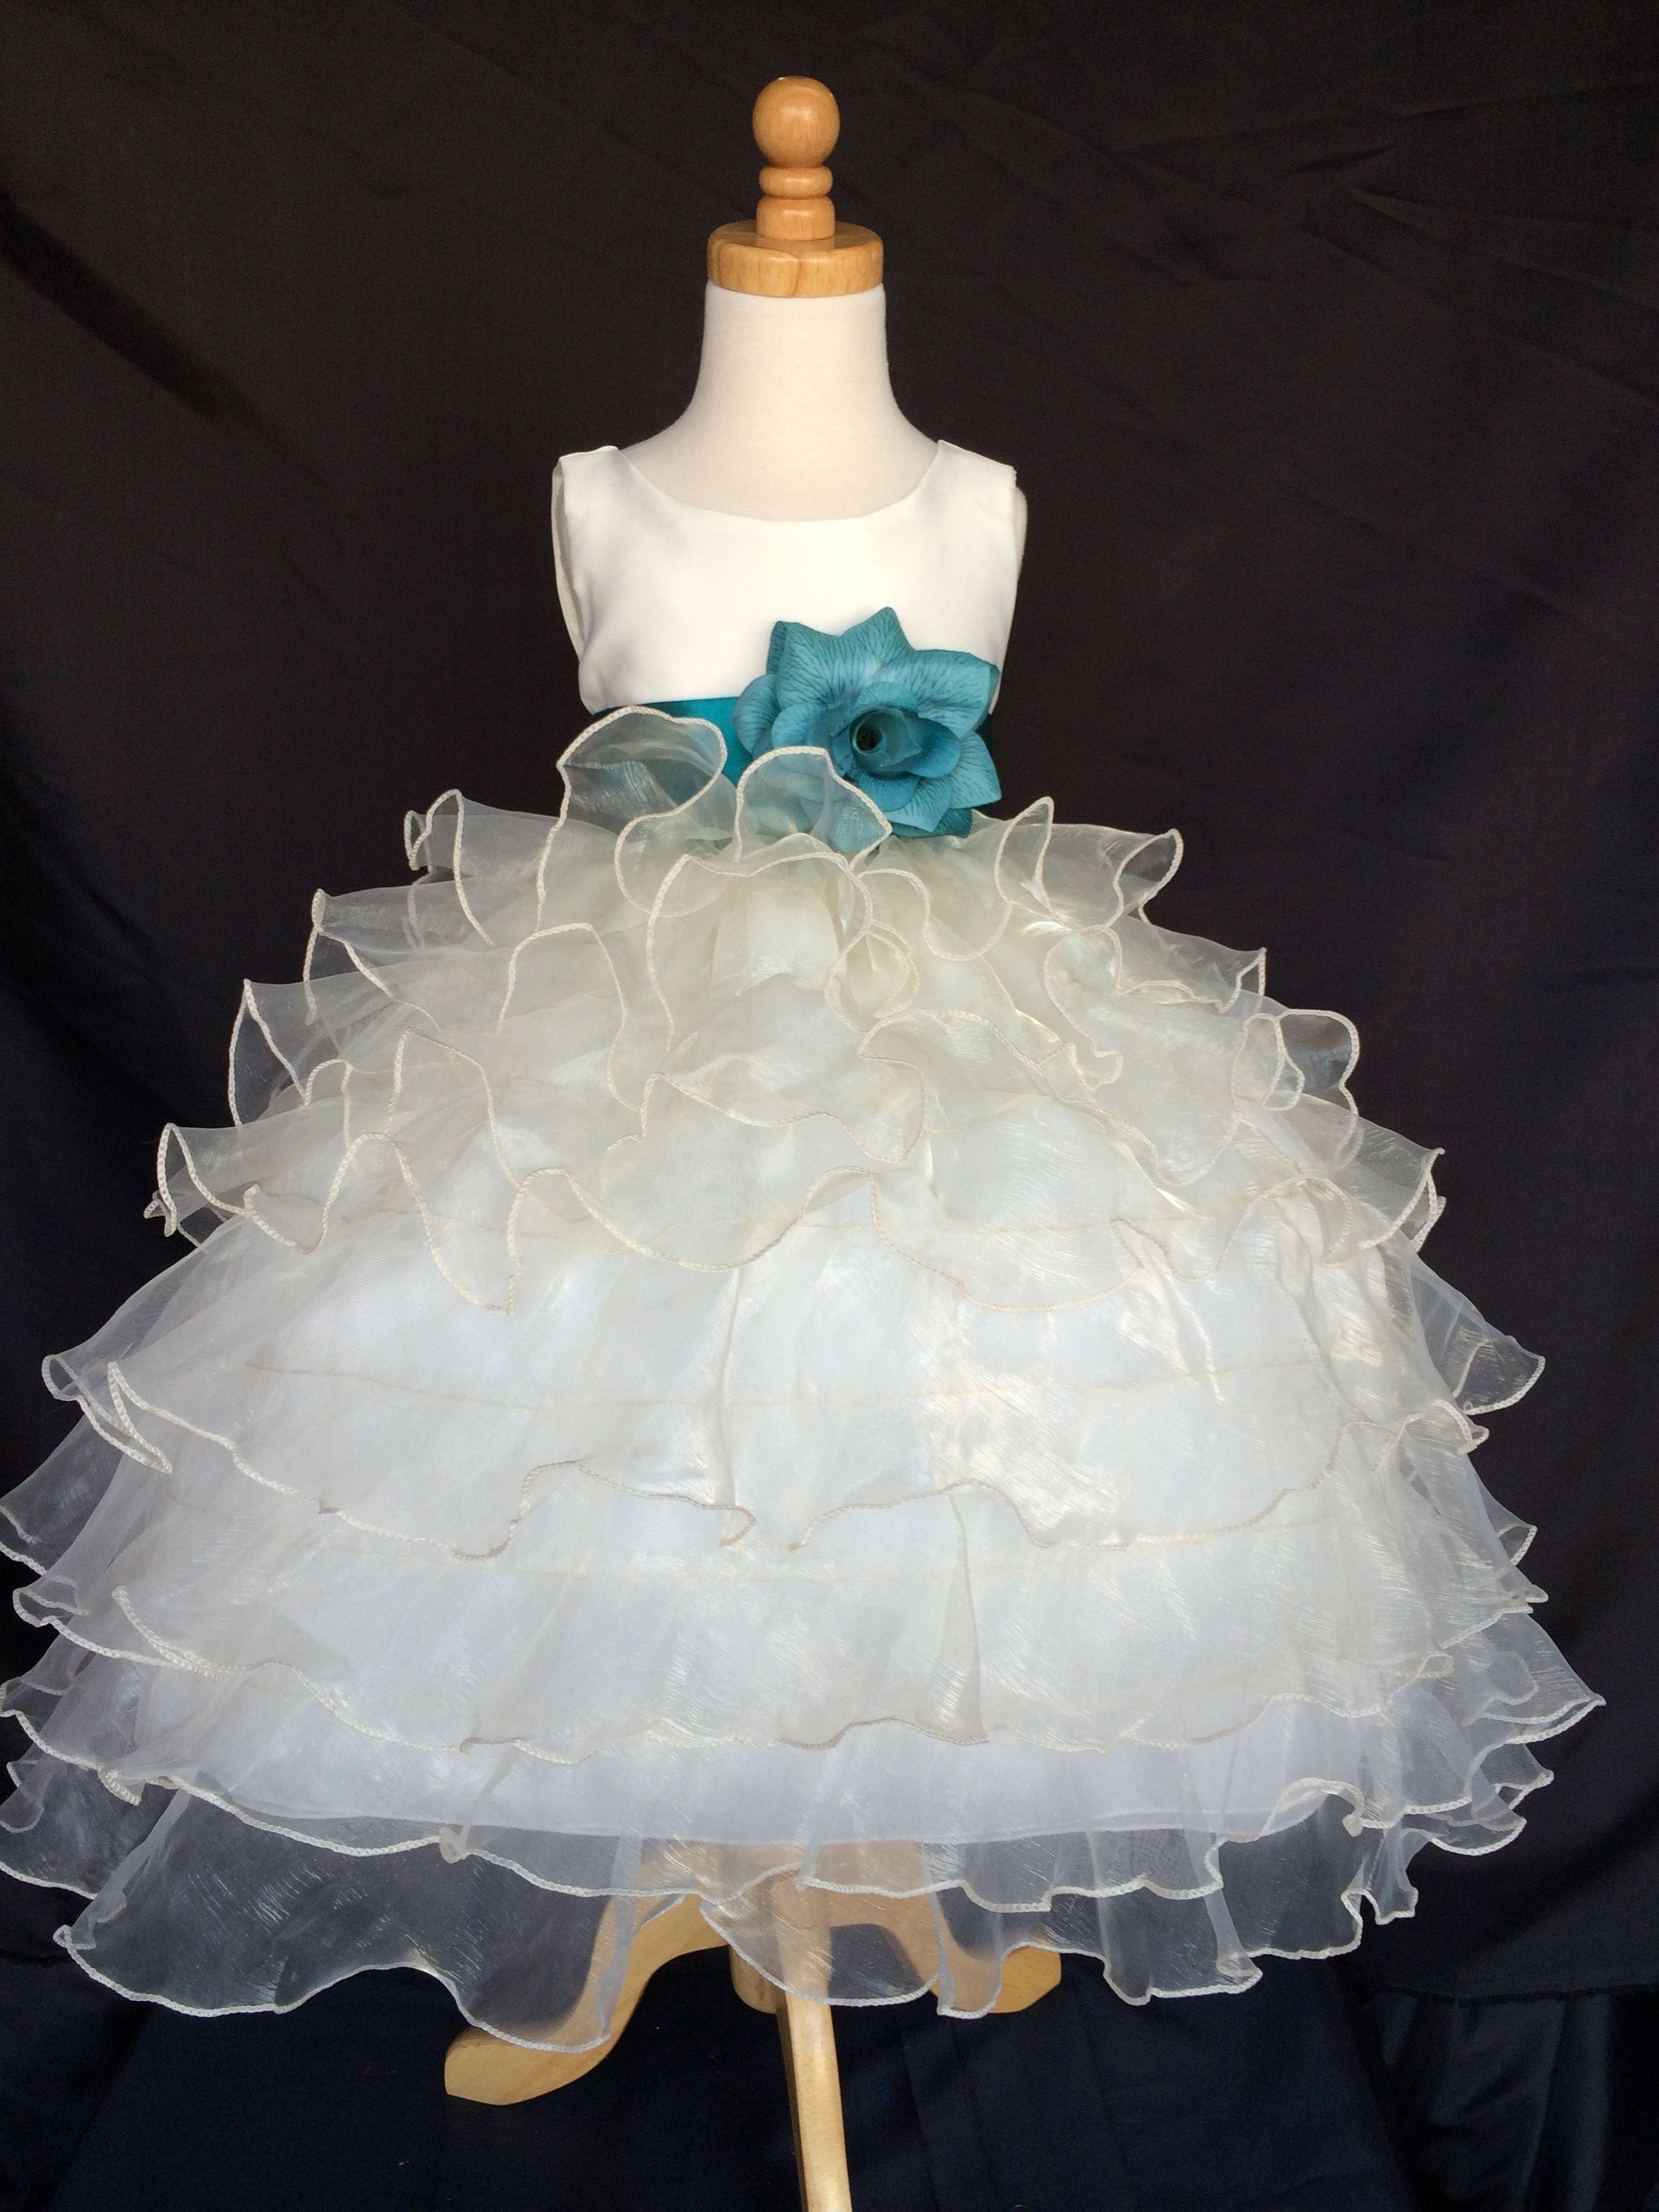 Flower girl bridesmaids ivory organza dress stunning sash and flower